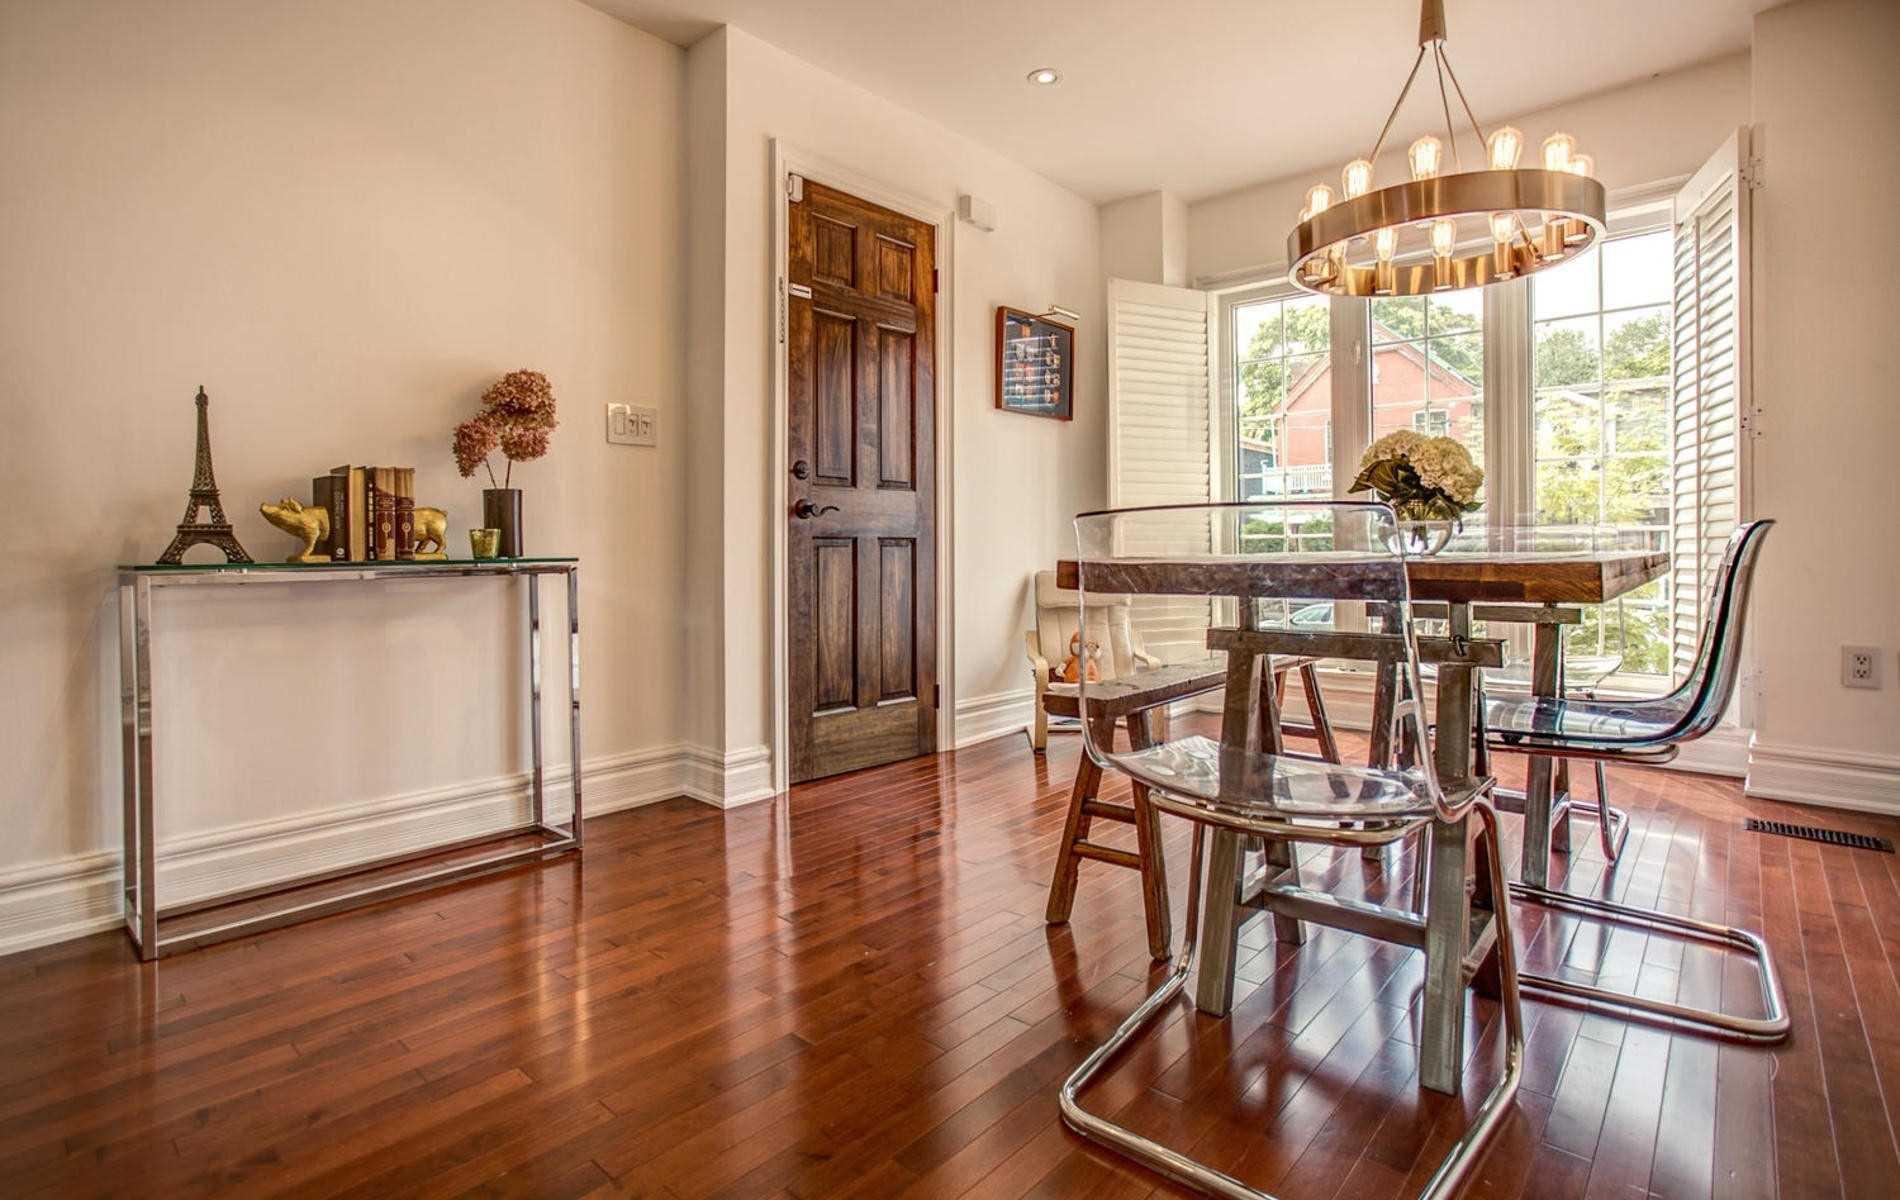 Photo 3: Photos: 119 Carlaw Avenue in Toronto: South Riverdale House (3-Storey) for lease (Toronto E01)  : MLS®# E4386176